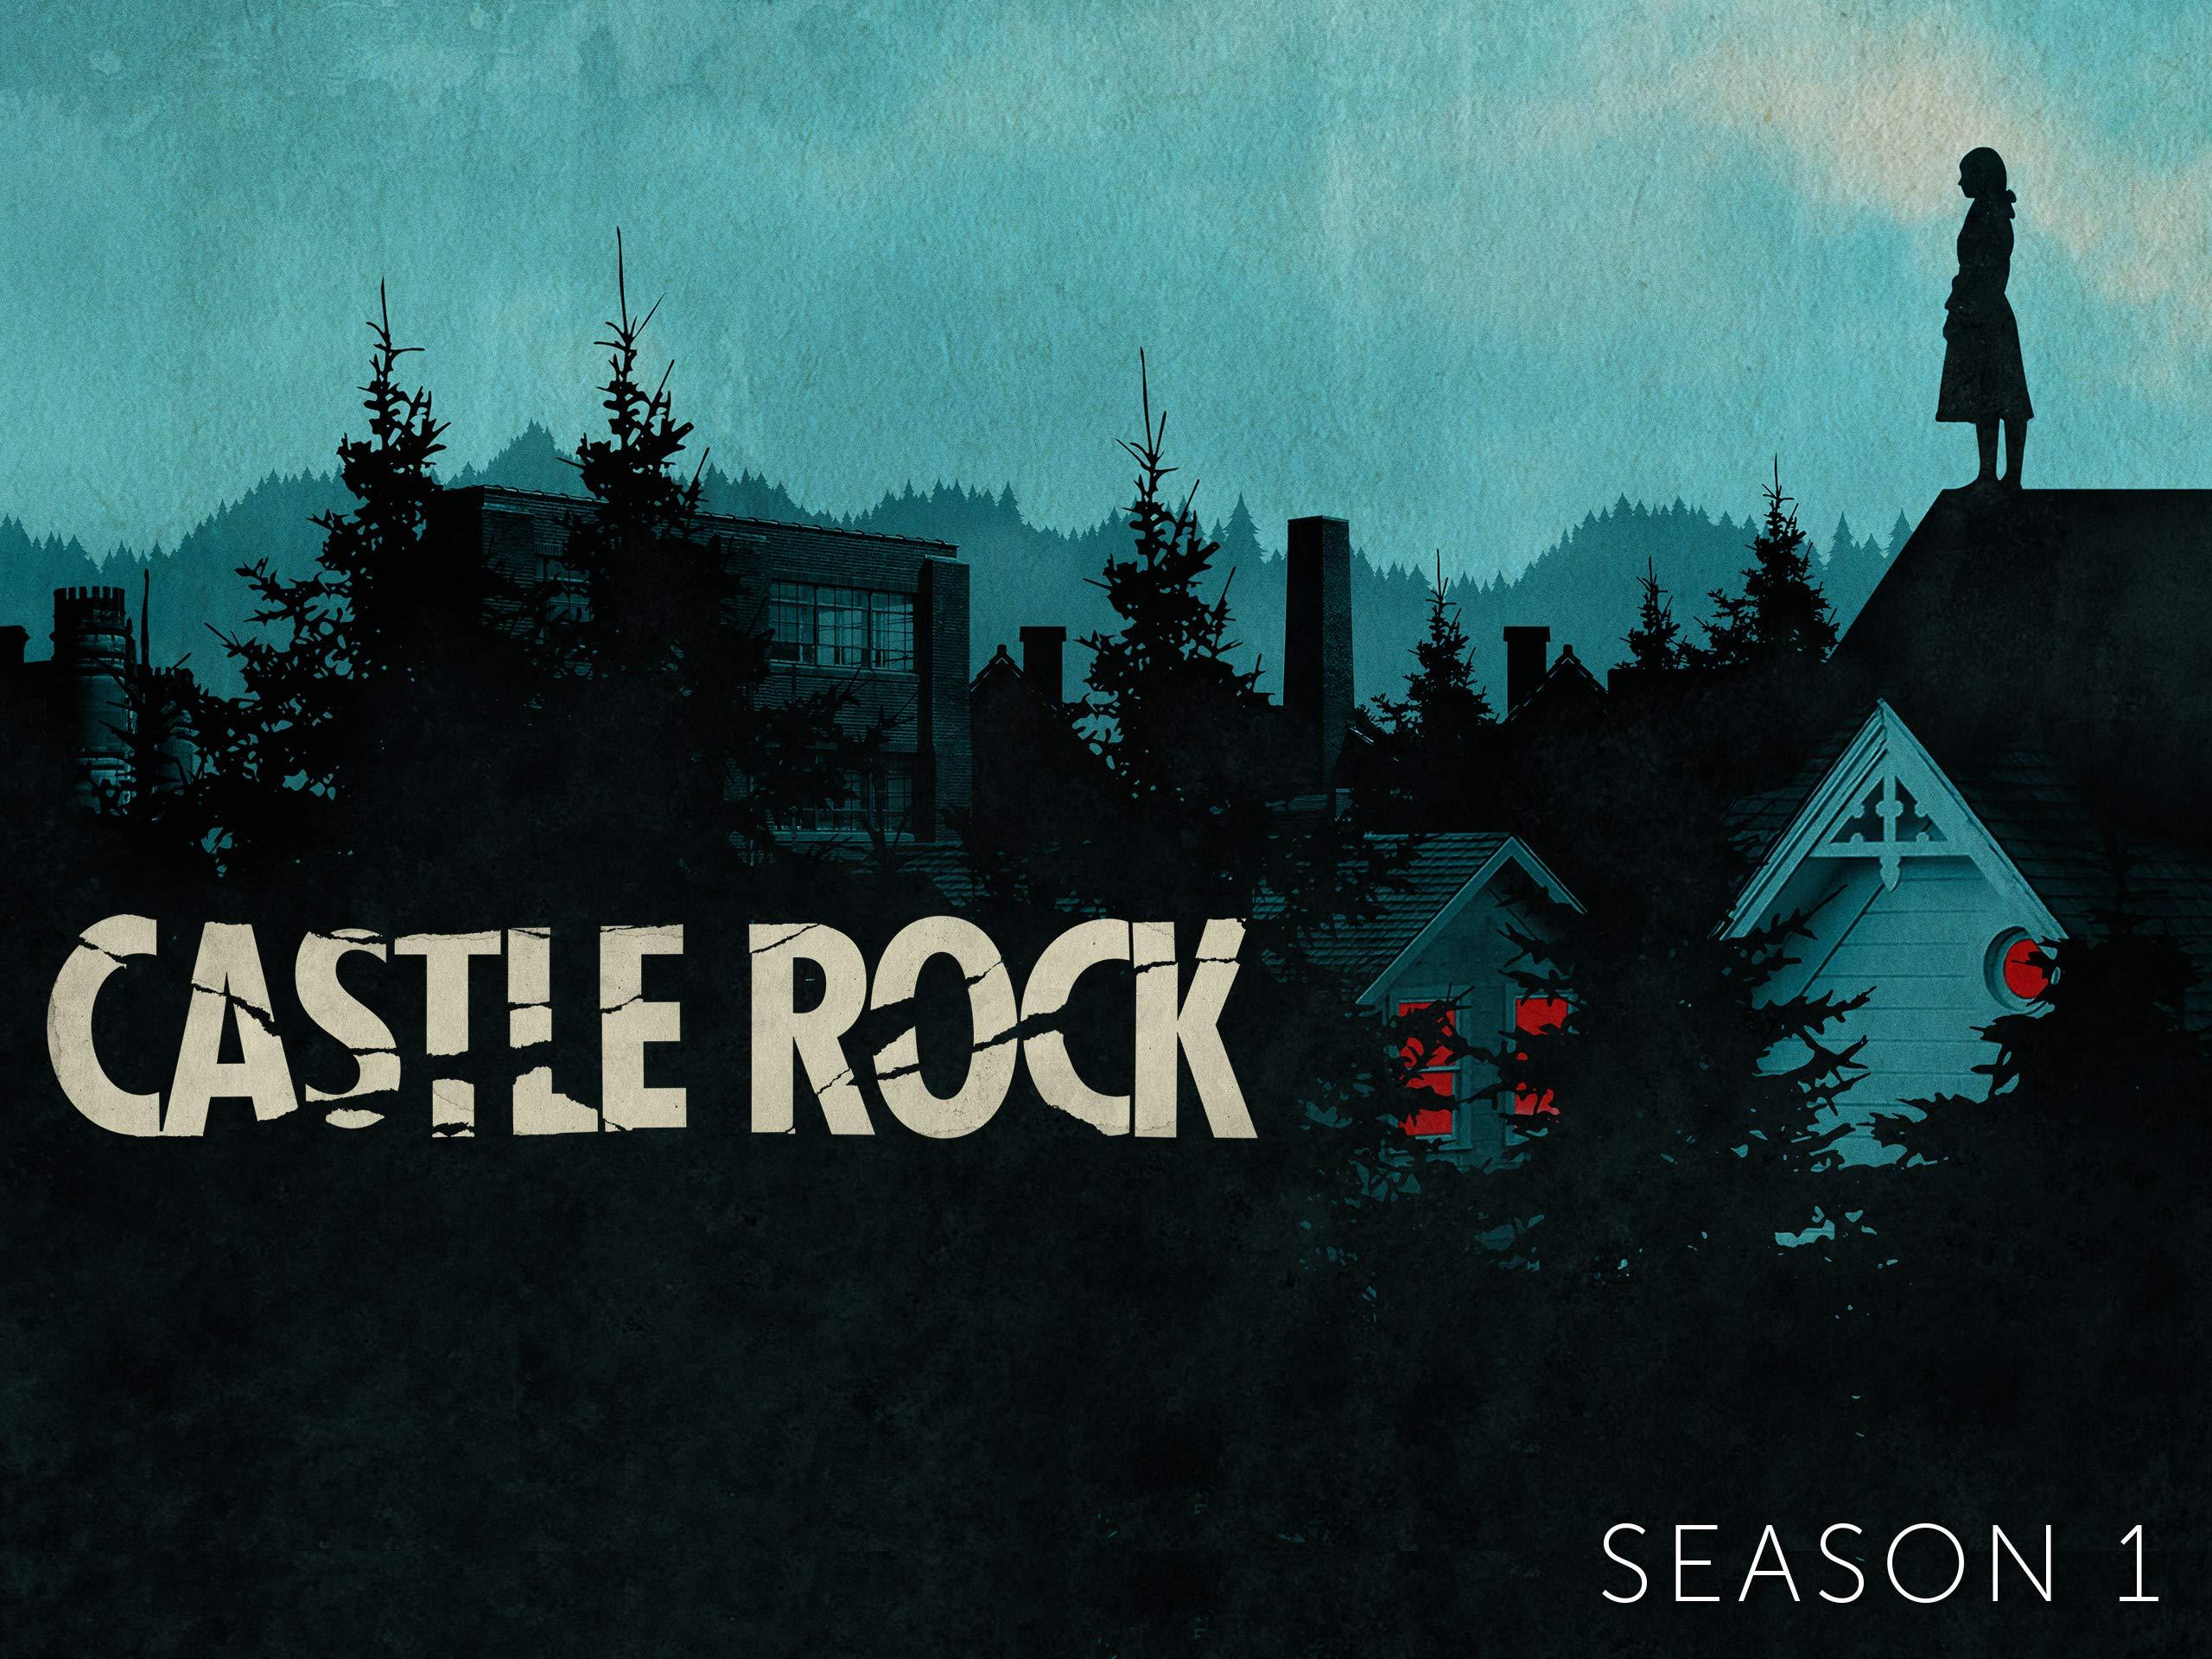 Amazon co uk: Watch Castle Rock - Season 1 | Prime Video